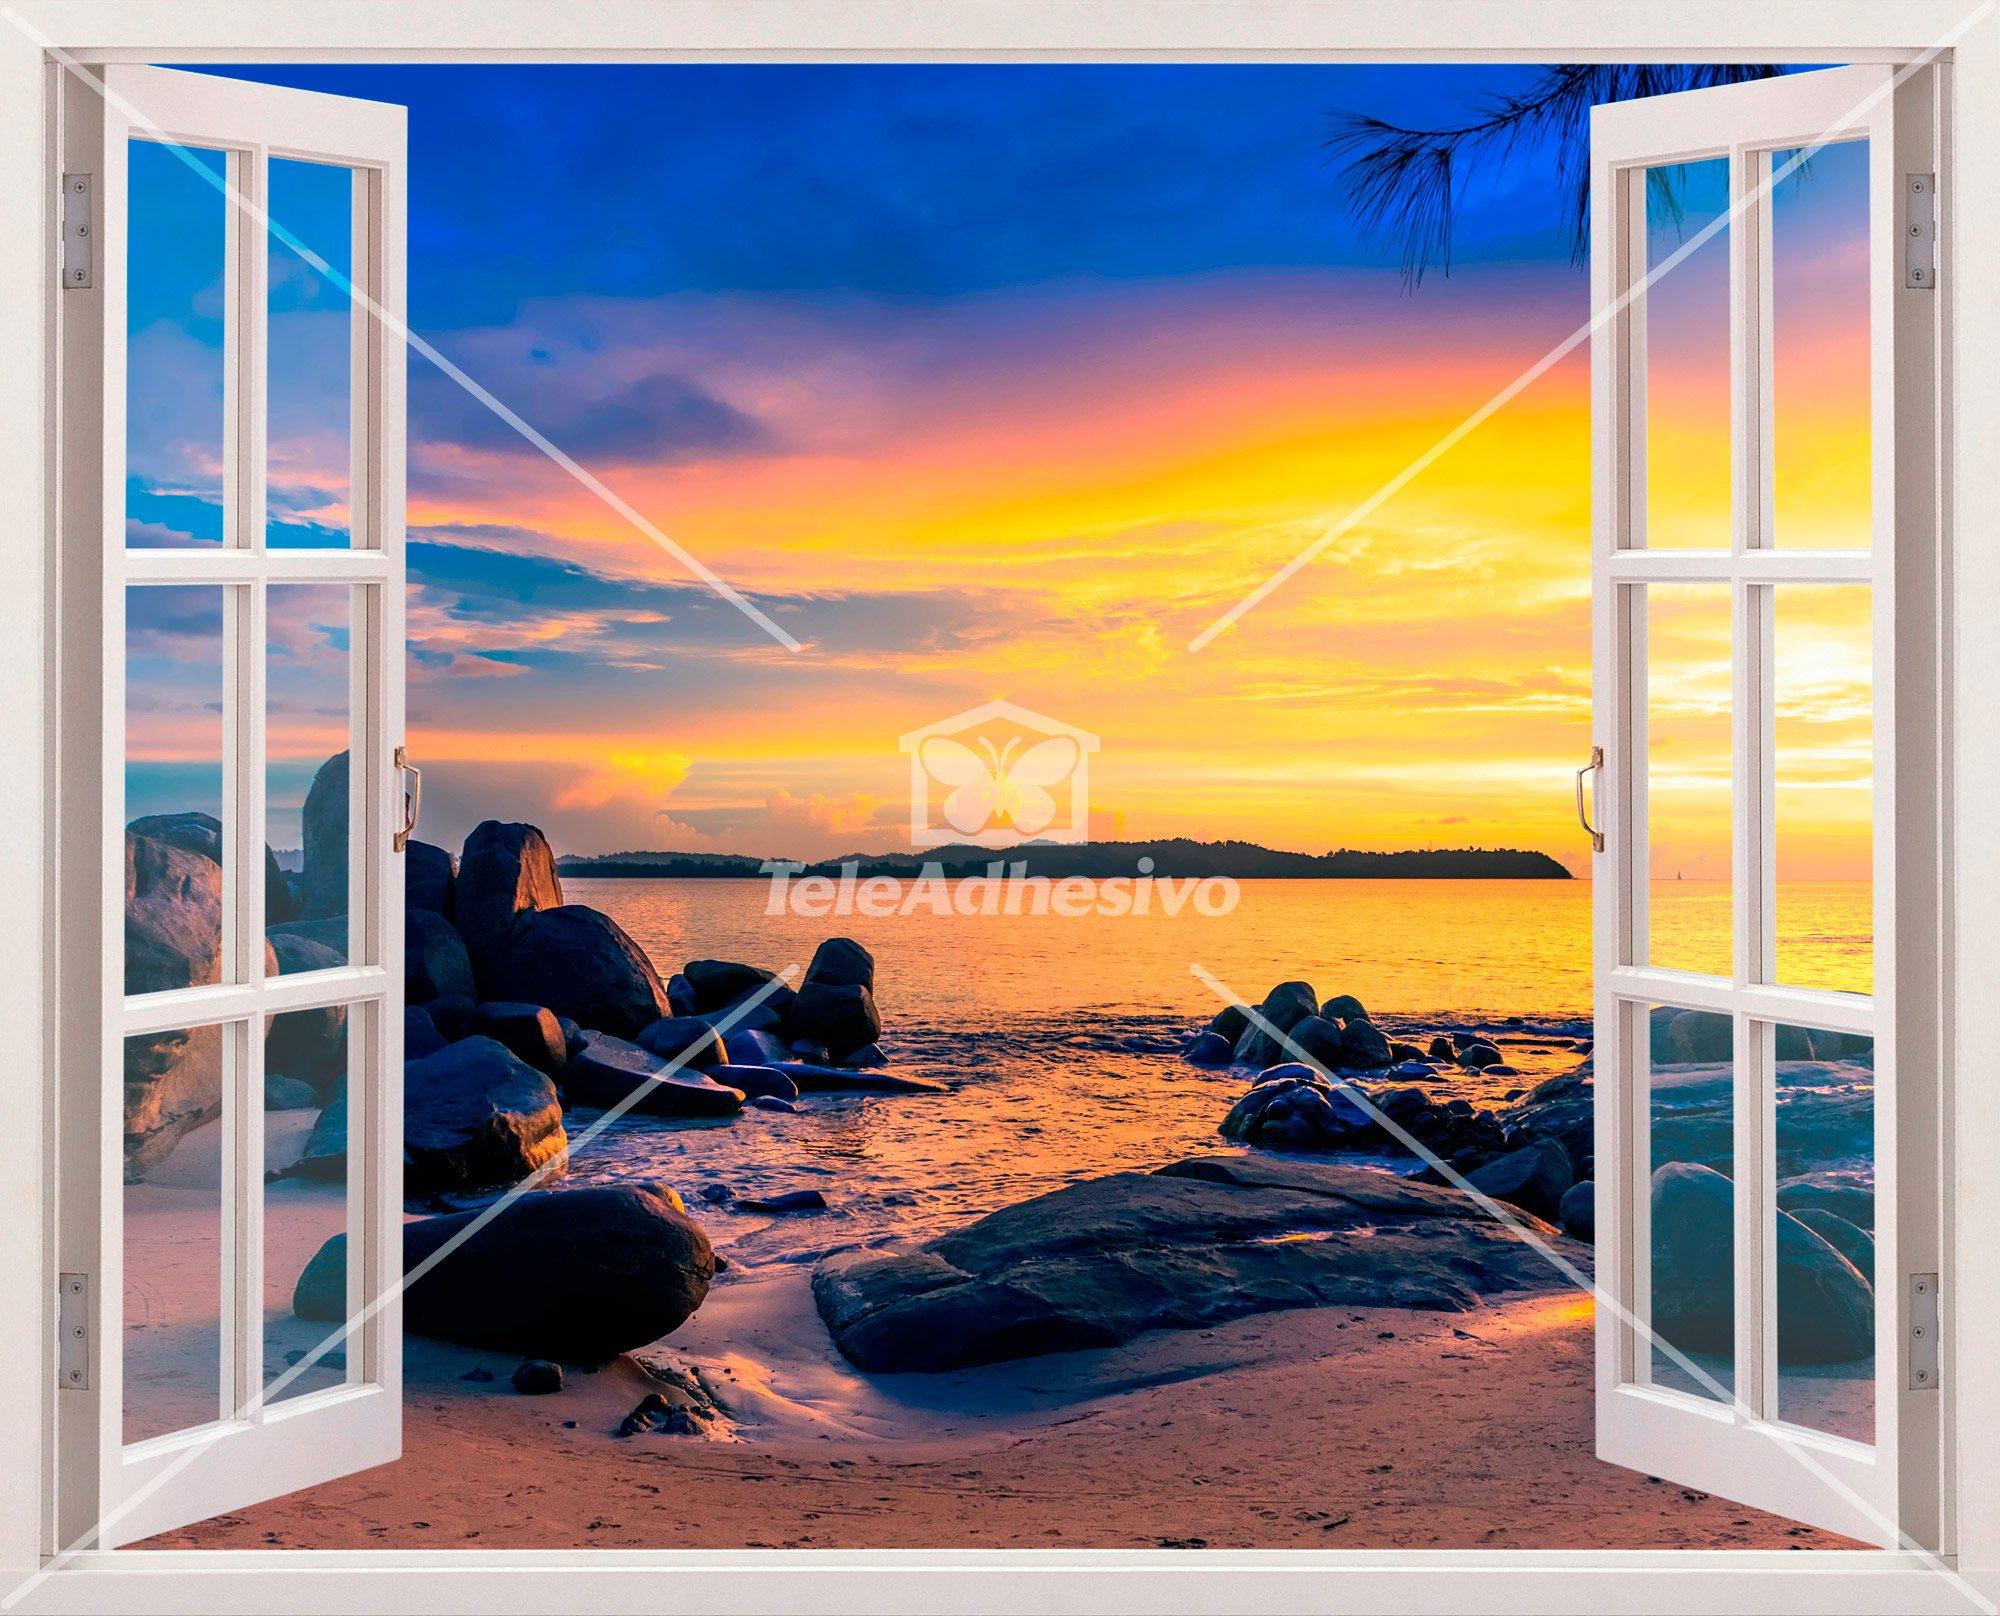 Wandtattoos: Sonnenuntergang am Strand 2